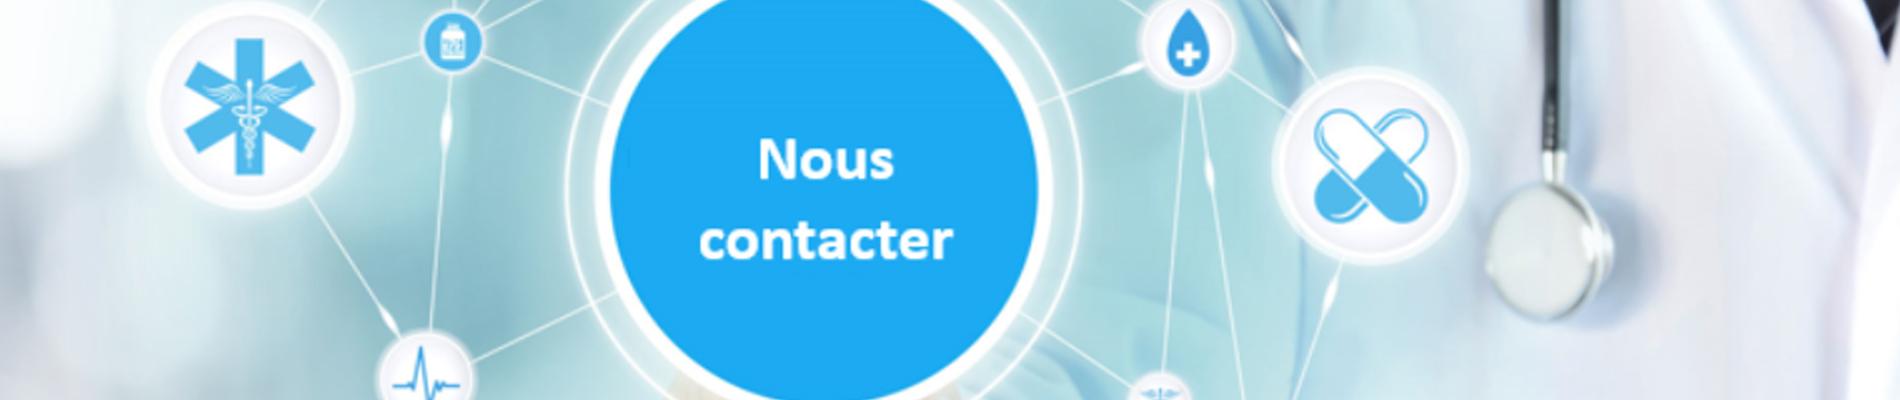 header-contact04